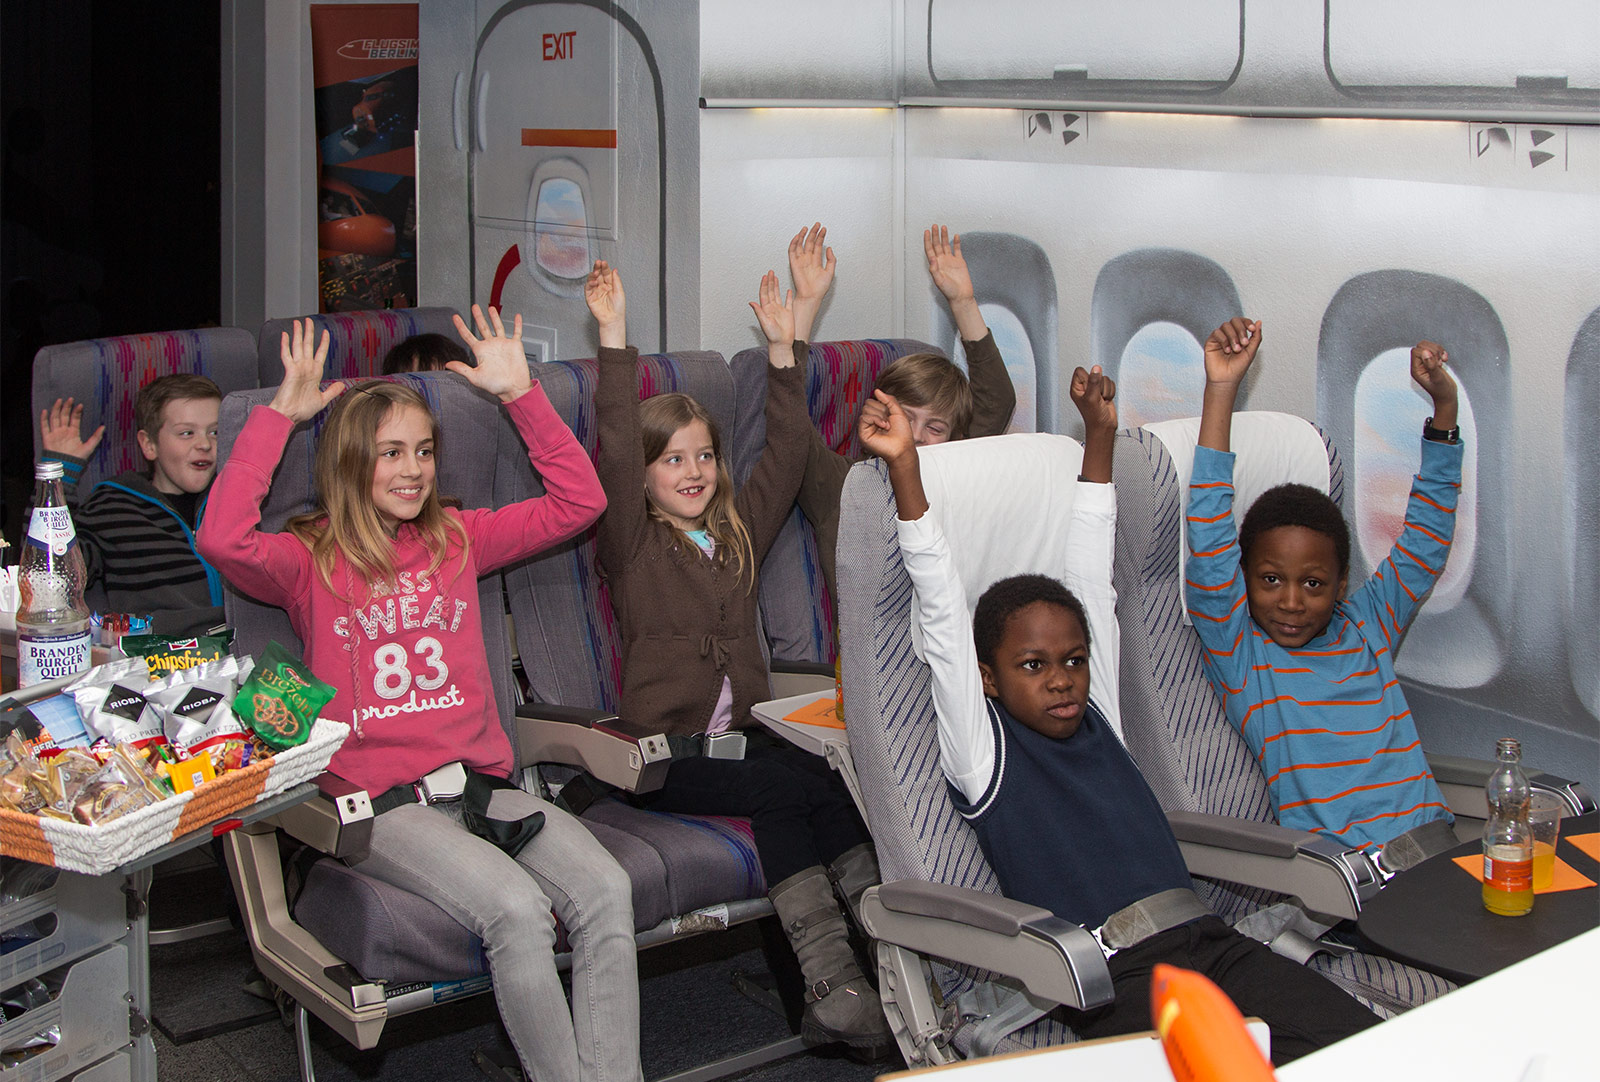 flugsimulator berlin sky tarif for kids kindergeburtstag events. Black Bedroom Furniture Sets. Home Design Ideas